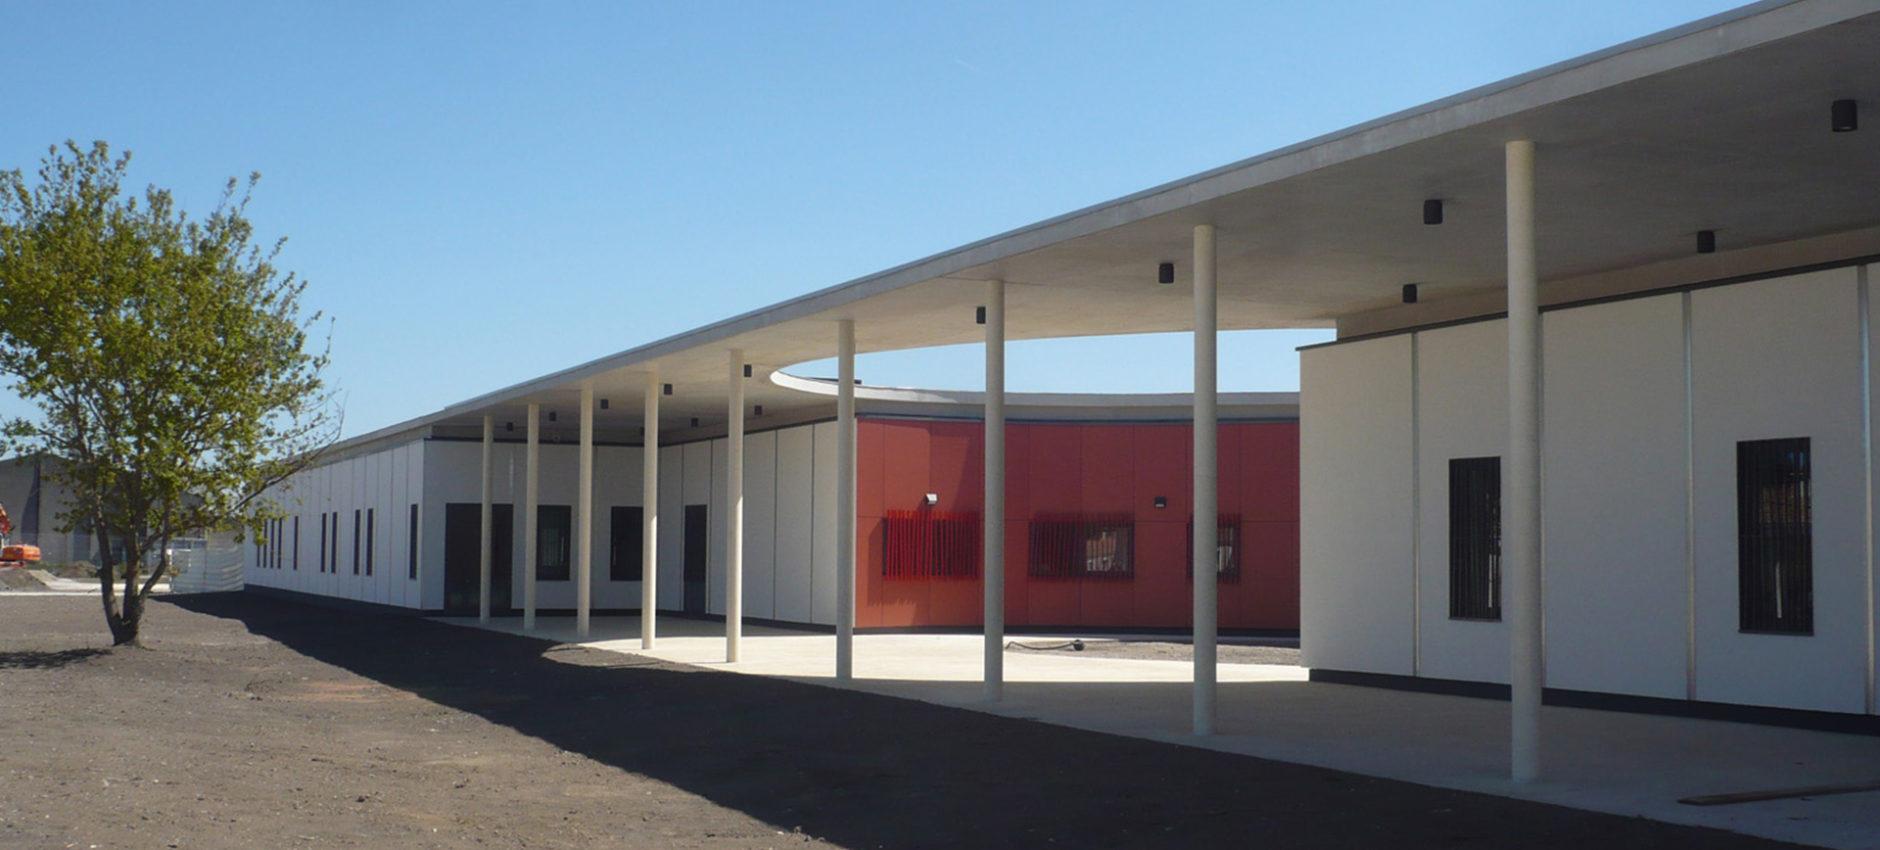 boca_architecture_projet_centre_detention_bedenac_01-1.jpg